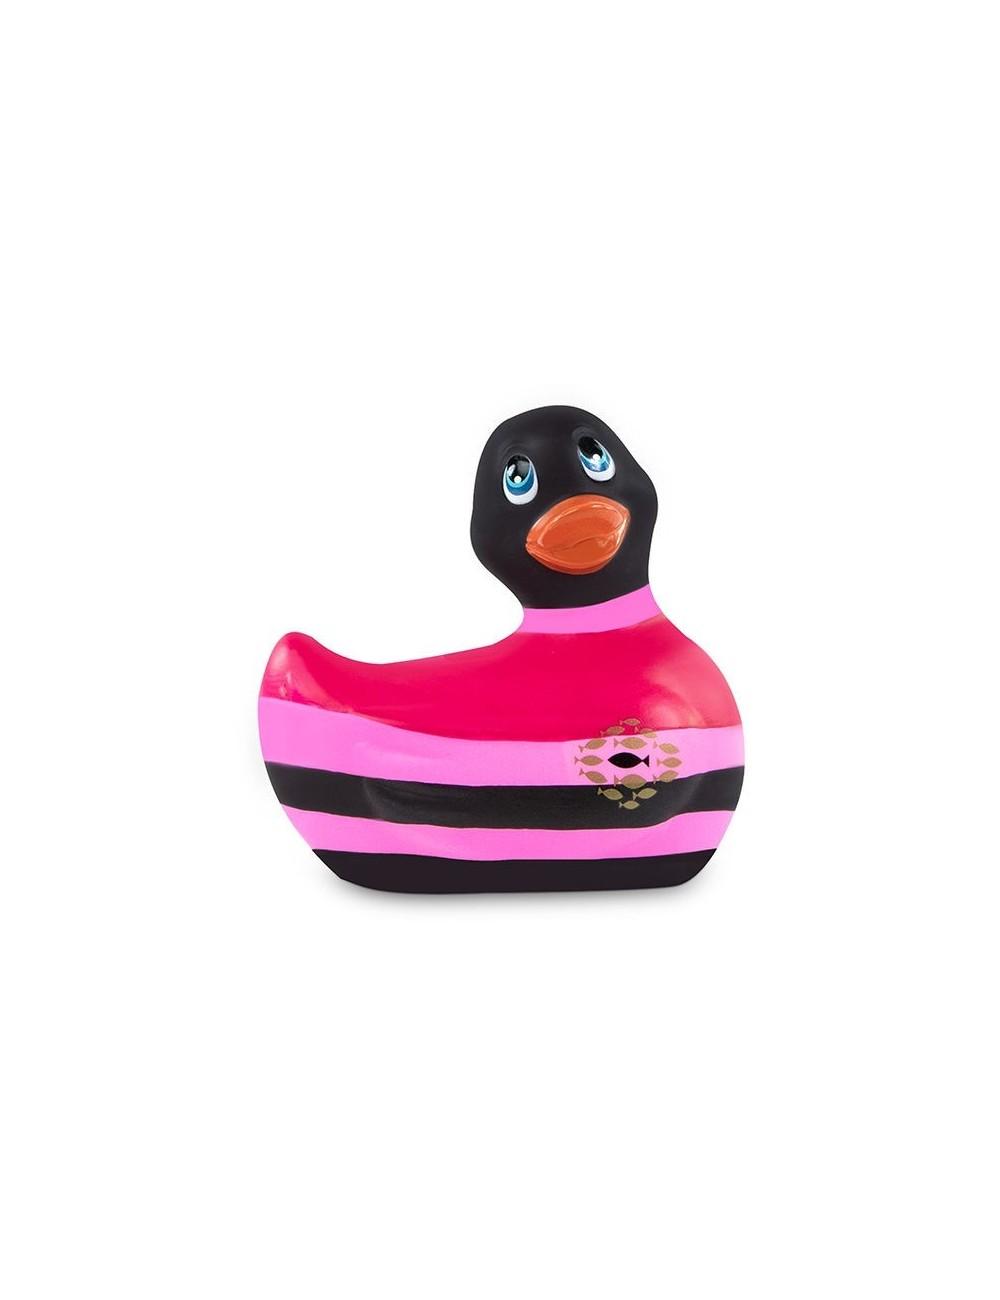 Canard vibrant Duckie 2.0 Colors noir Big Teaze Toys